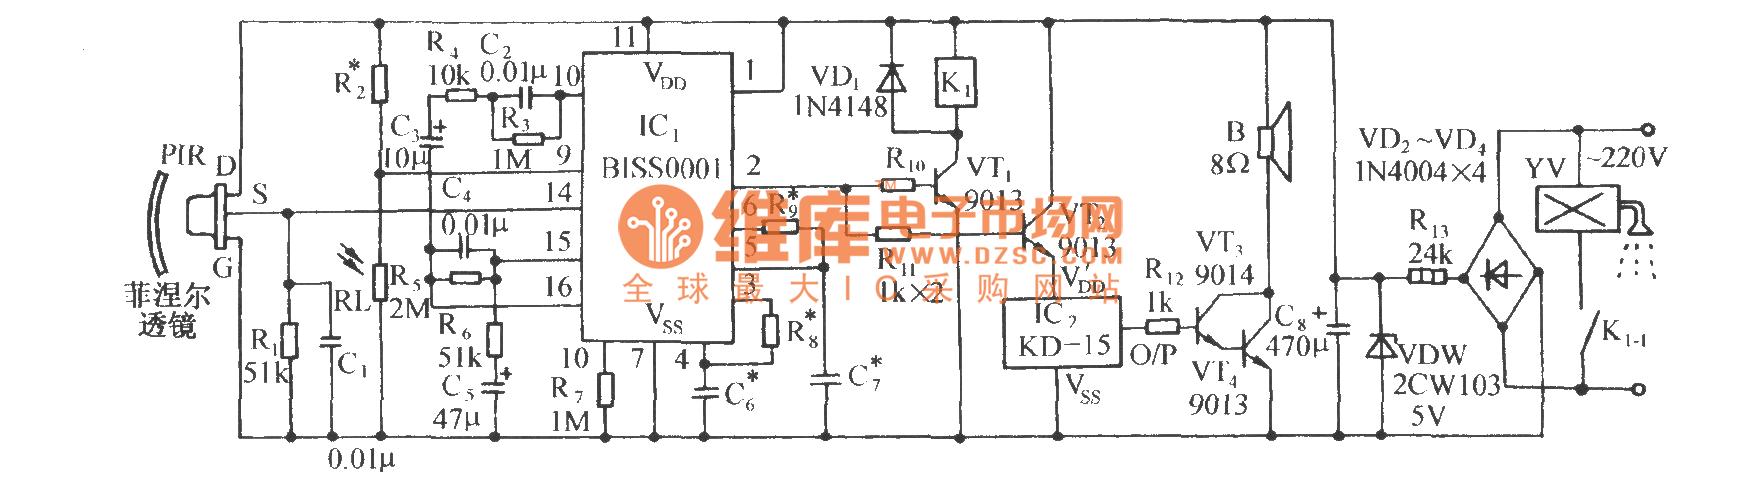 Infrared Sensor Automatic Sprinkler Control Circuit Diagram Using Geigercounteri Controlcircuit Seekiccom Biss0001